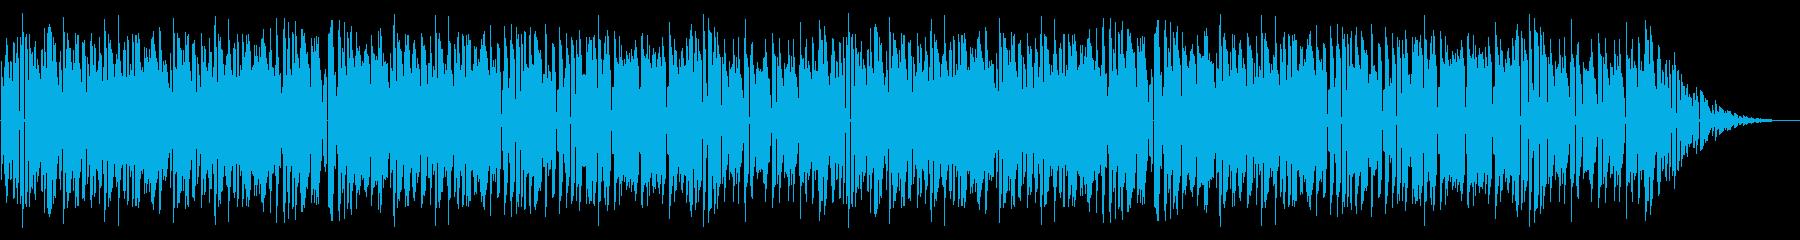 NES アクションD04-1(ステージ3の再生済みの波形